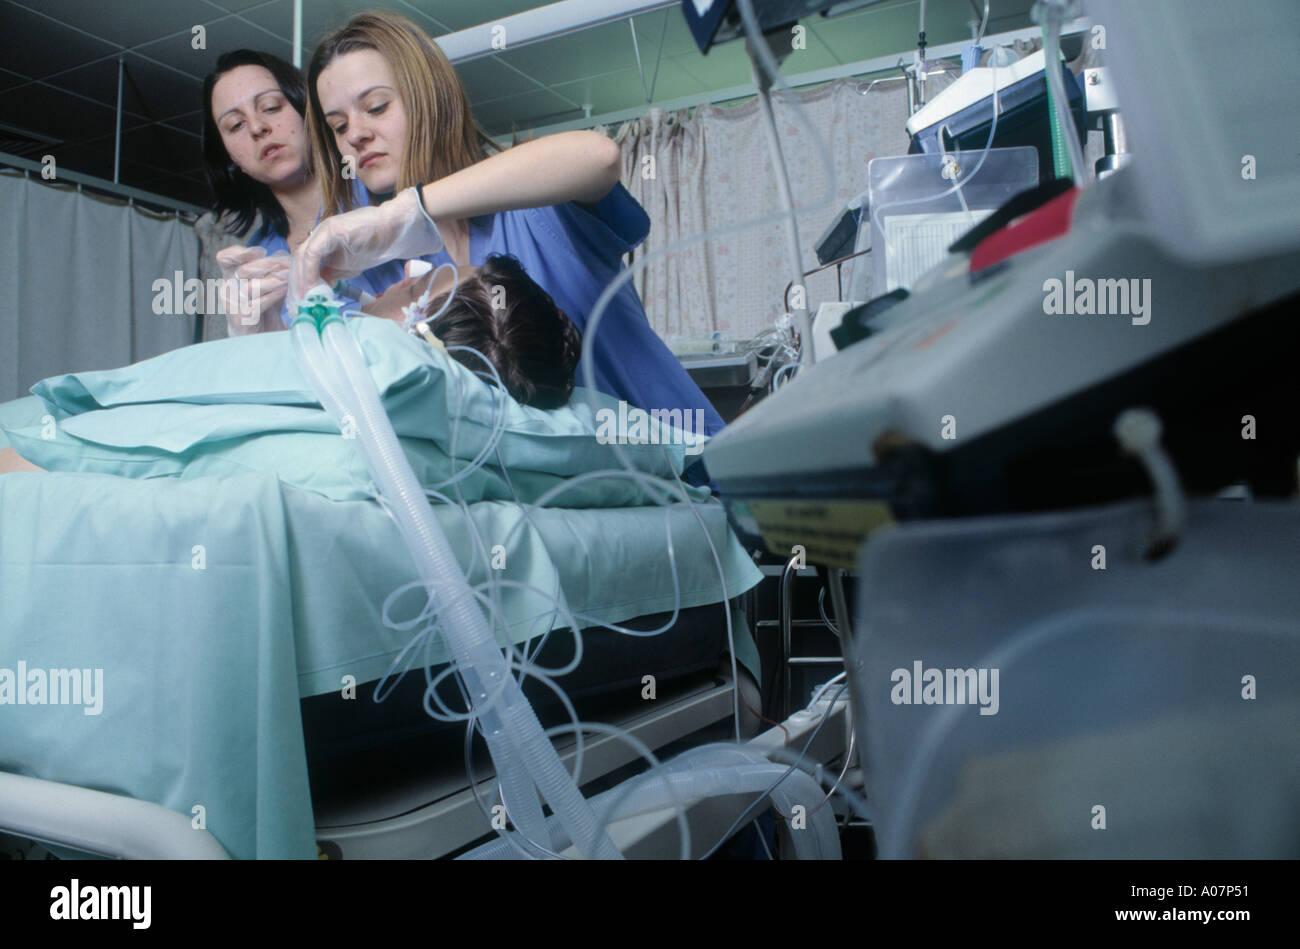 spanish-nurses-put-a-patient-on-oxygen-i